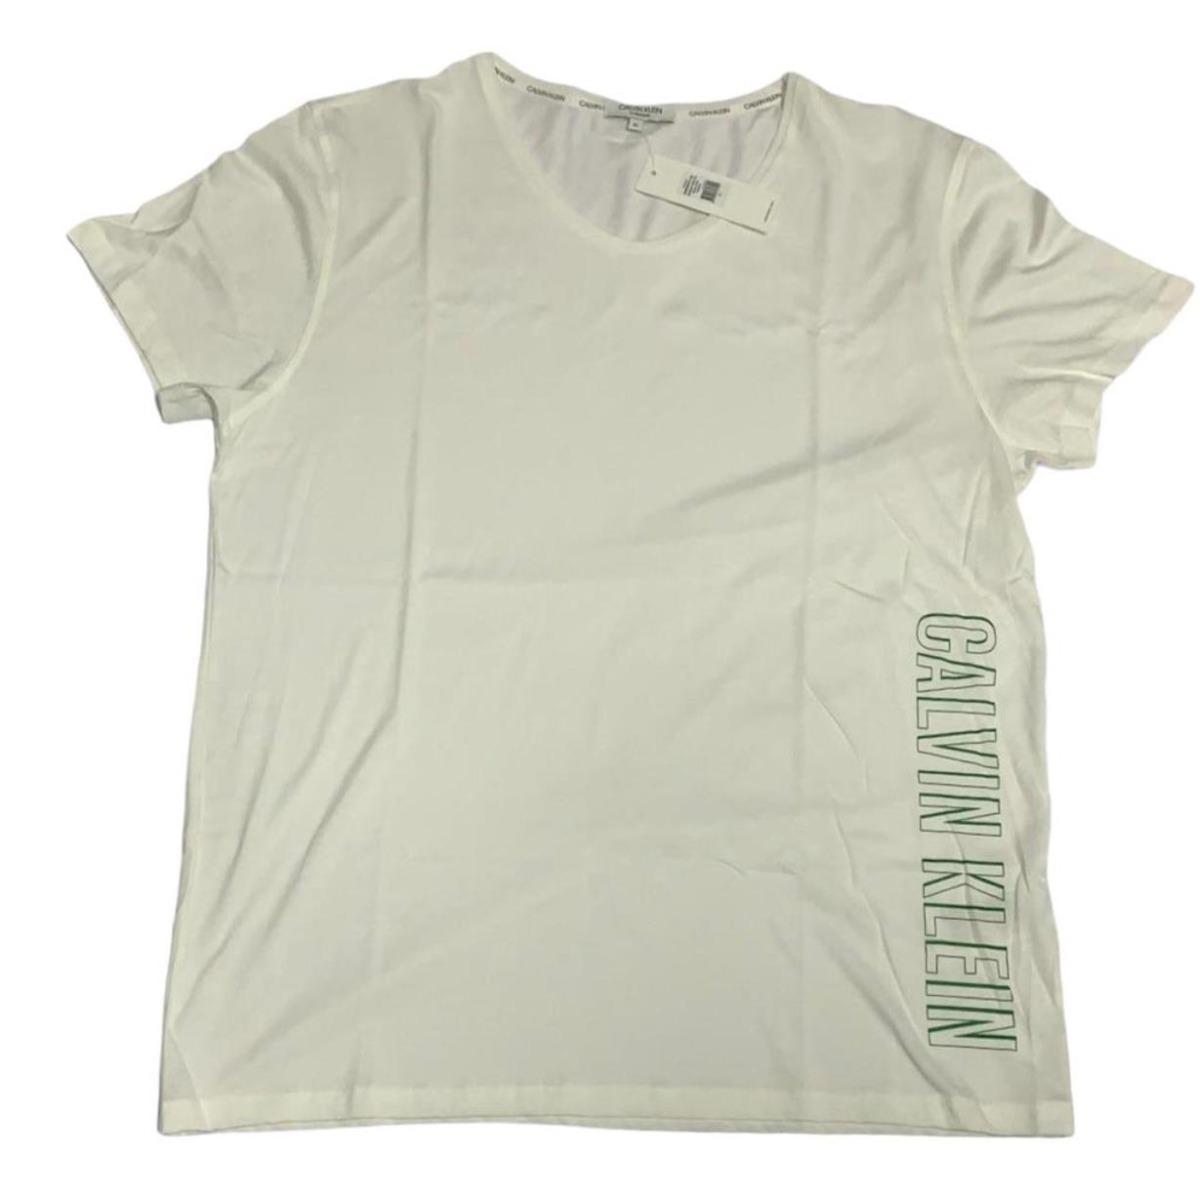 pretty nice db07d 4692b Calvin klein T-shirt uomo mezza manica ck km00333 1511016 1904230000450